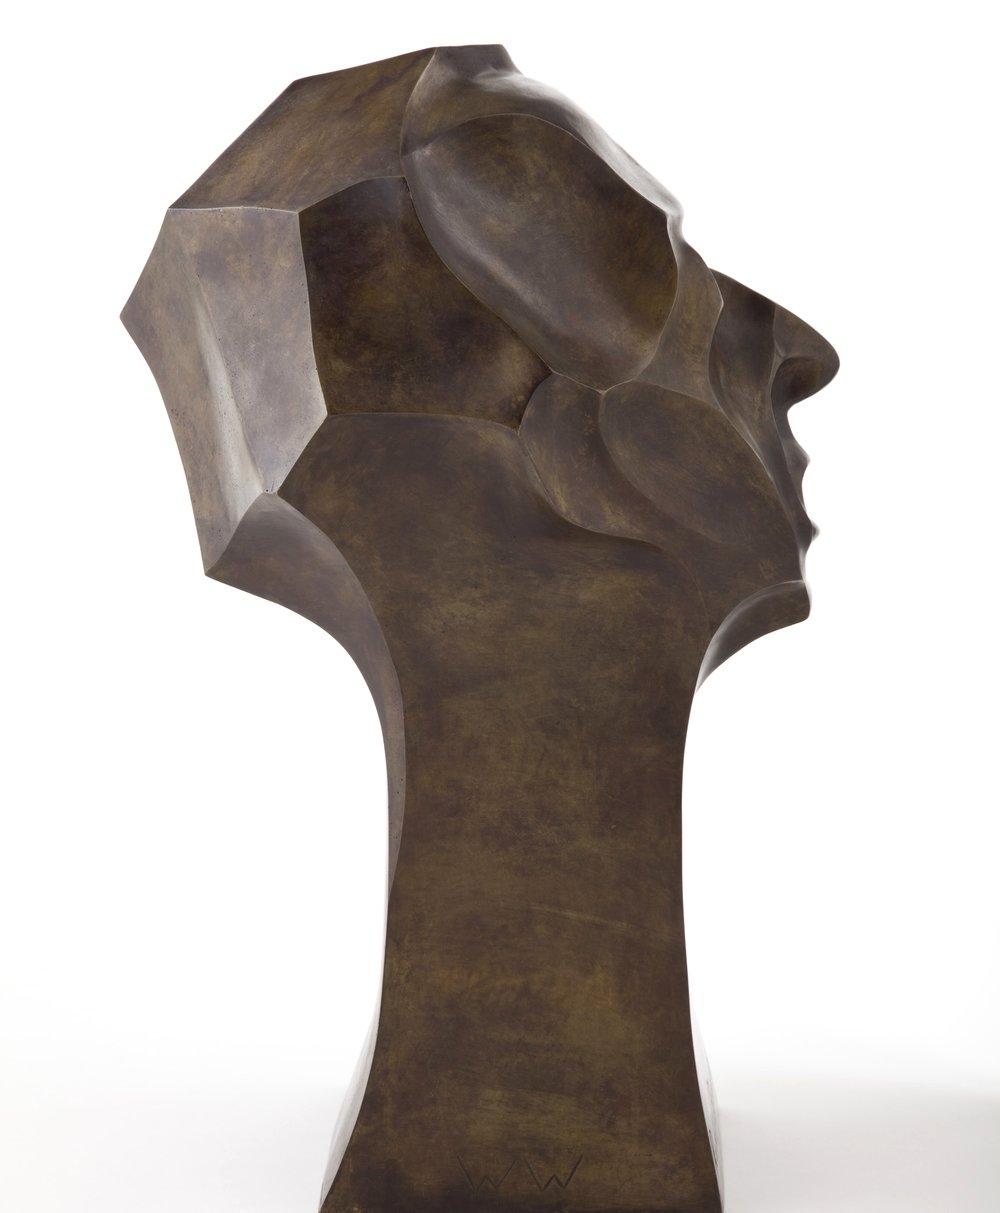 Rudolf Blümner   , 1919, William Wauer. Photographed for Neue Galerie, New York